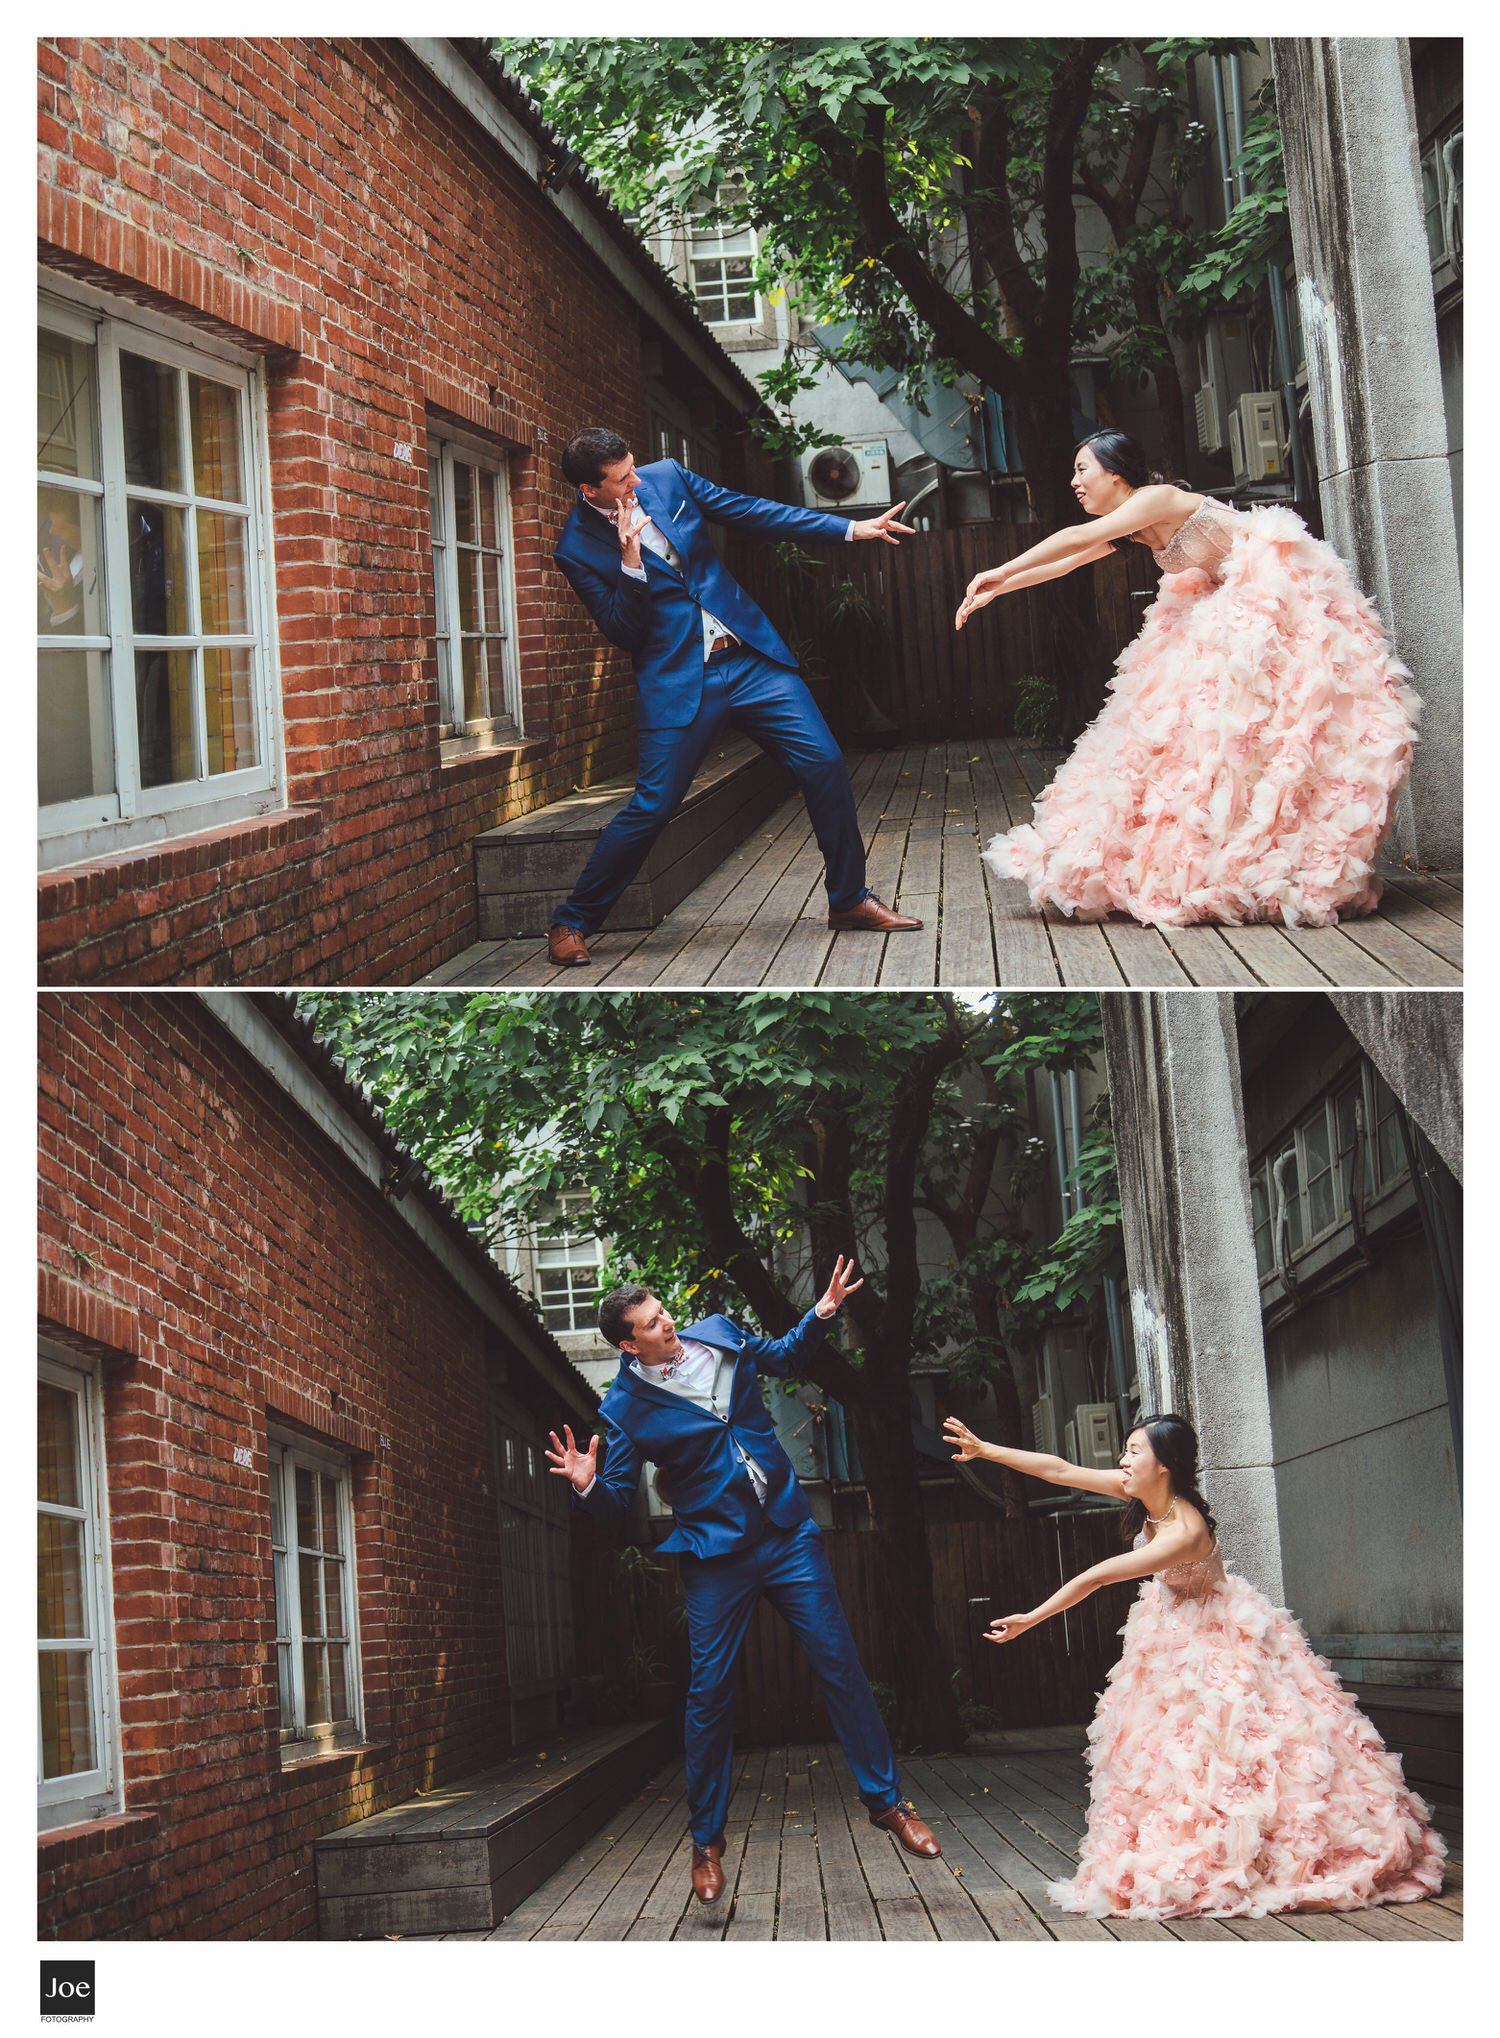 joe-fotography-pre-wedding-kay-jeff-040.jpg